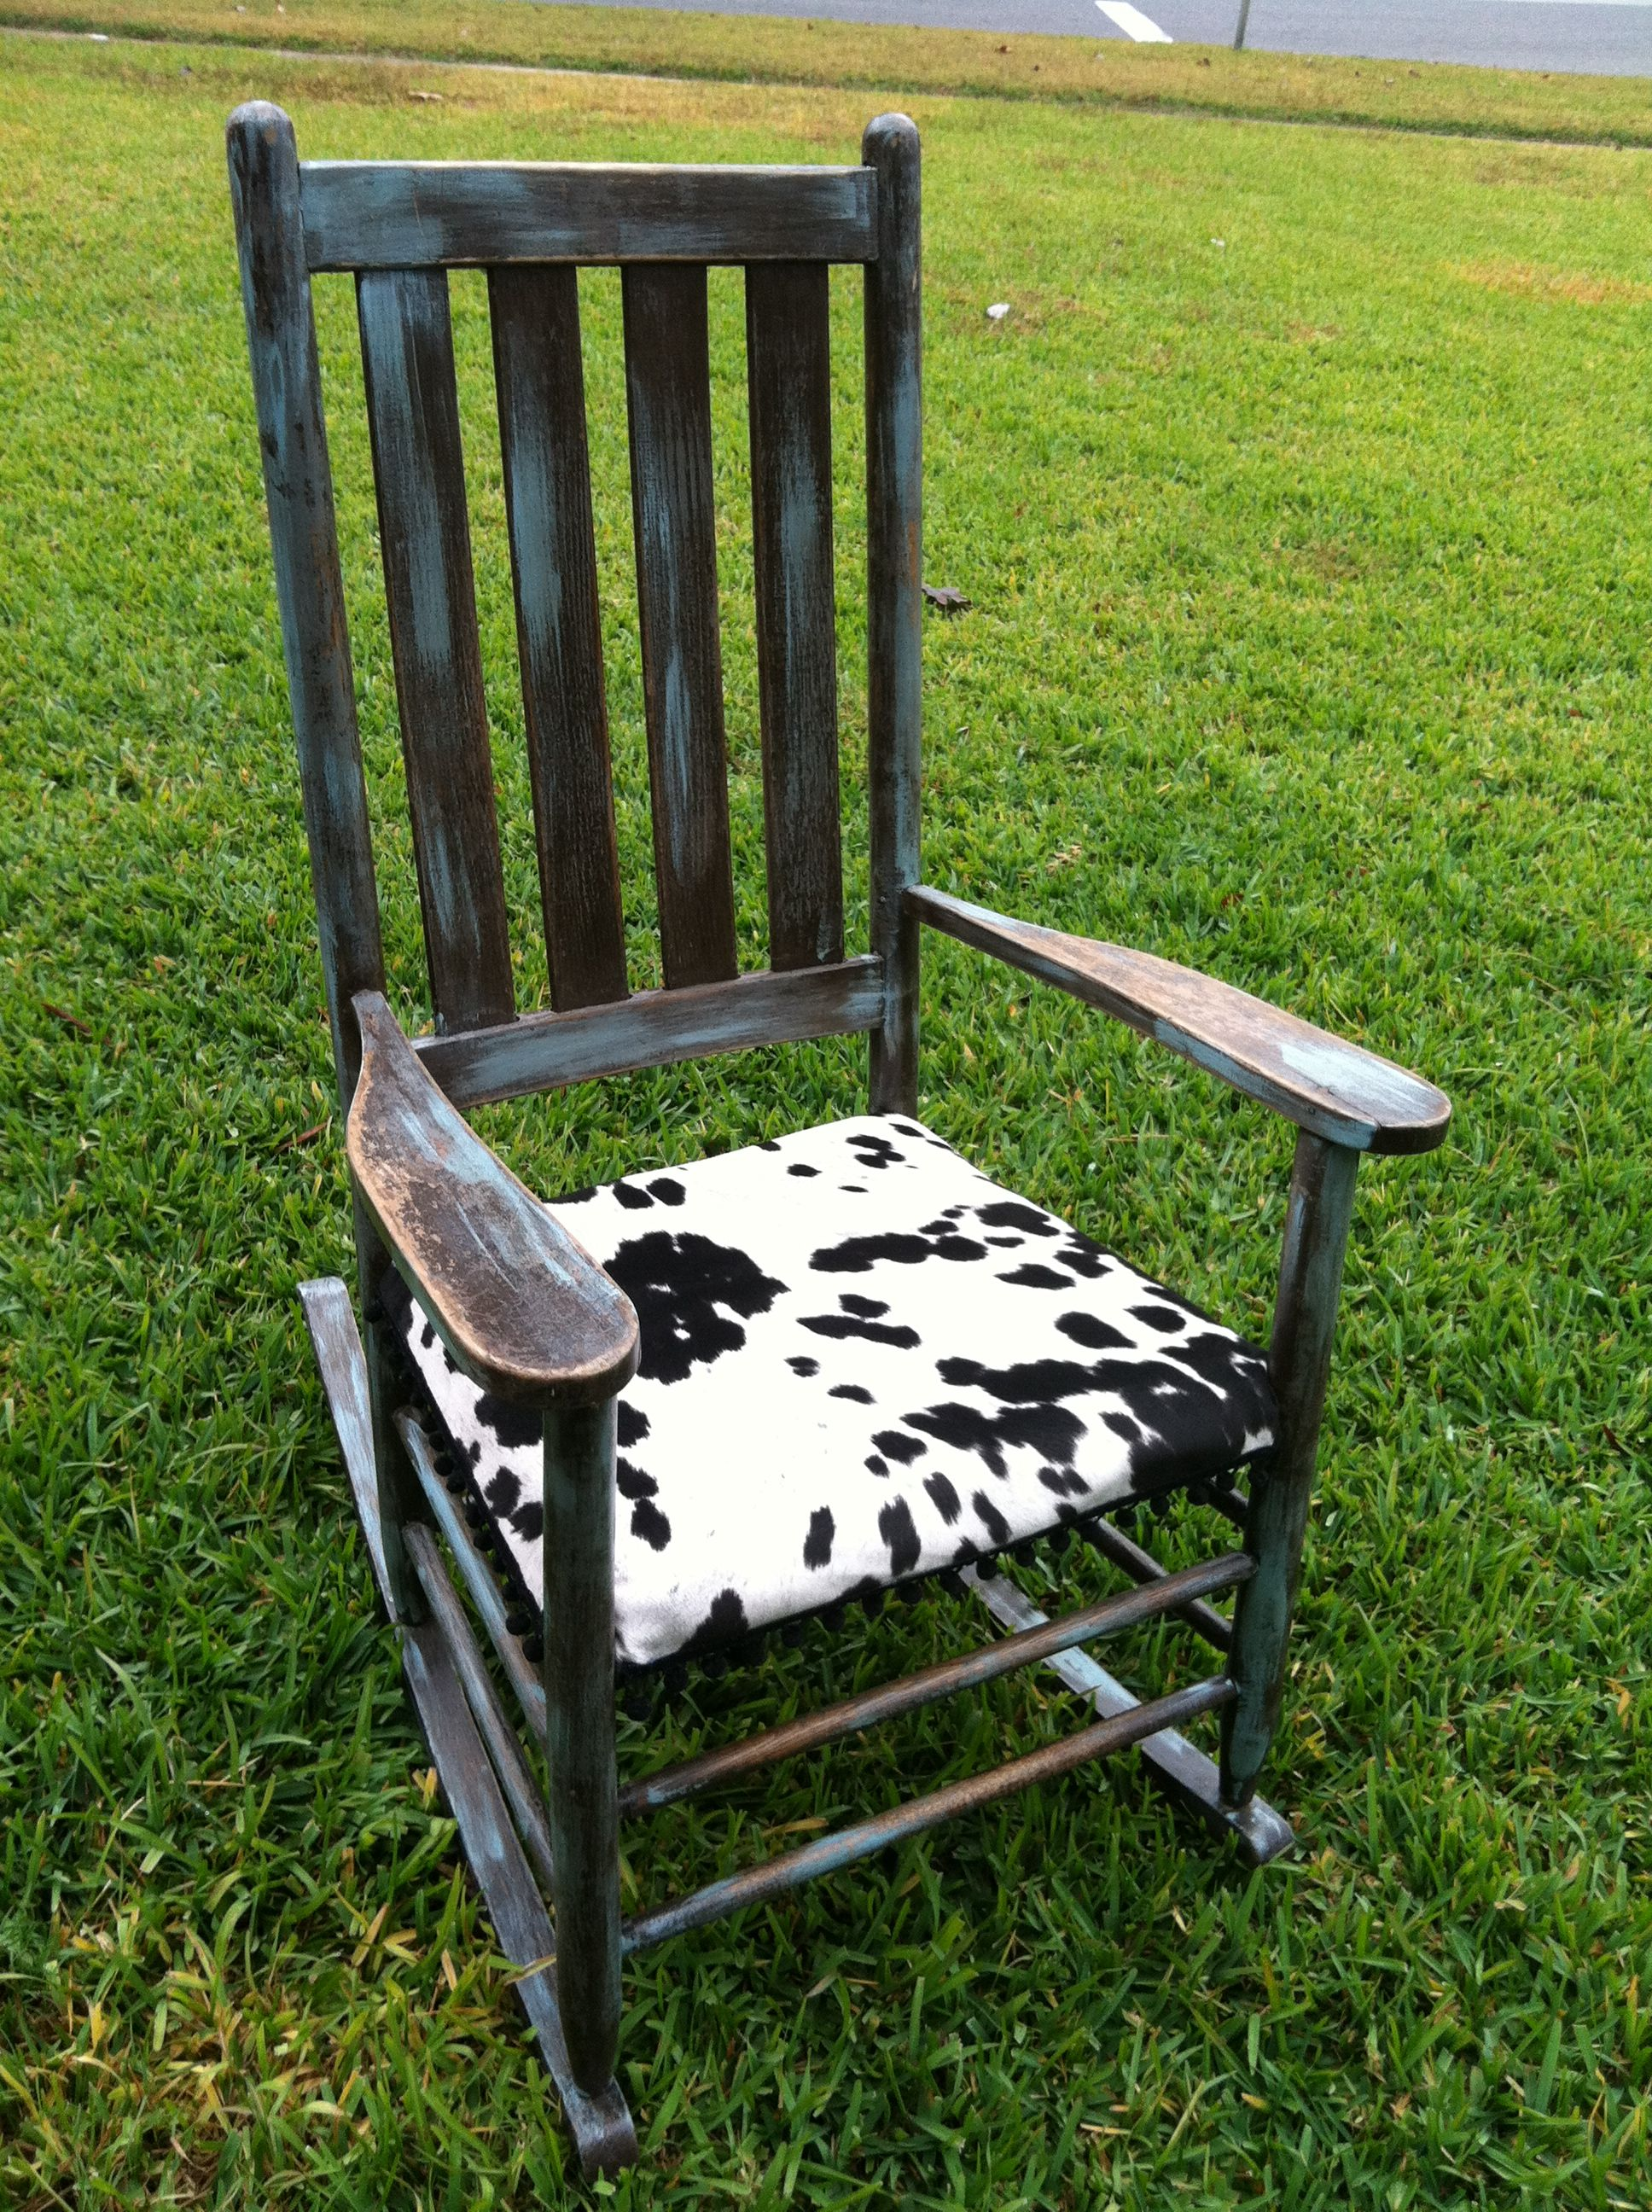 Deer Antler Rocking Chair Posture Control Repurposed With Velvet Cow Print Seat